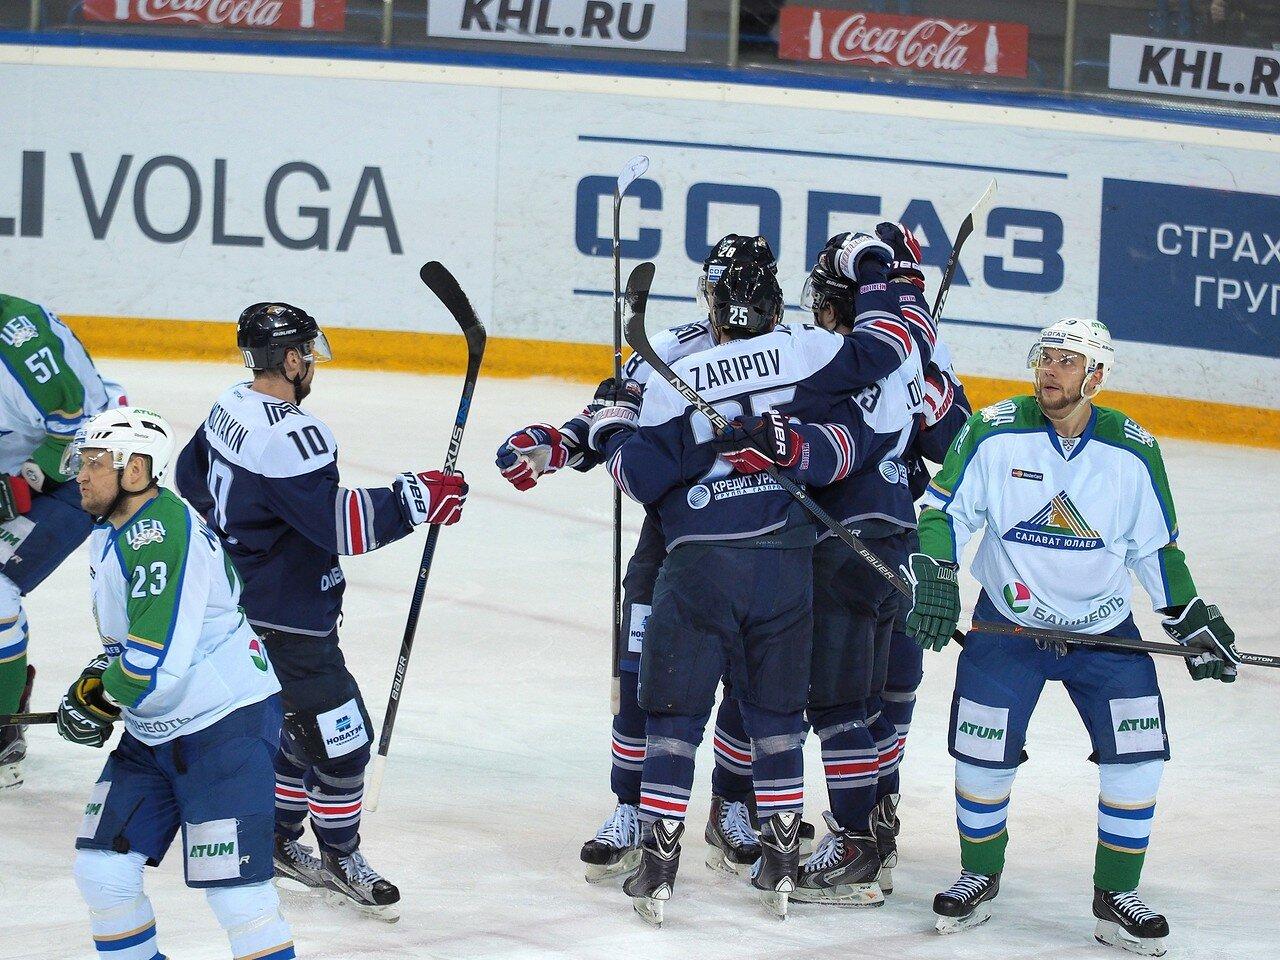 65Плей-офф 2016 Восток Финал Металлург - Салават Юлаев 31.03.2016